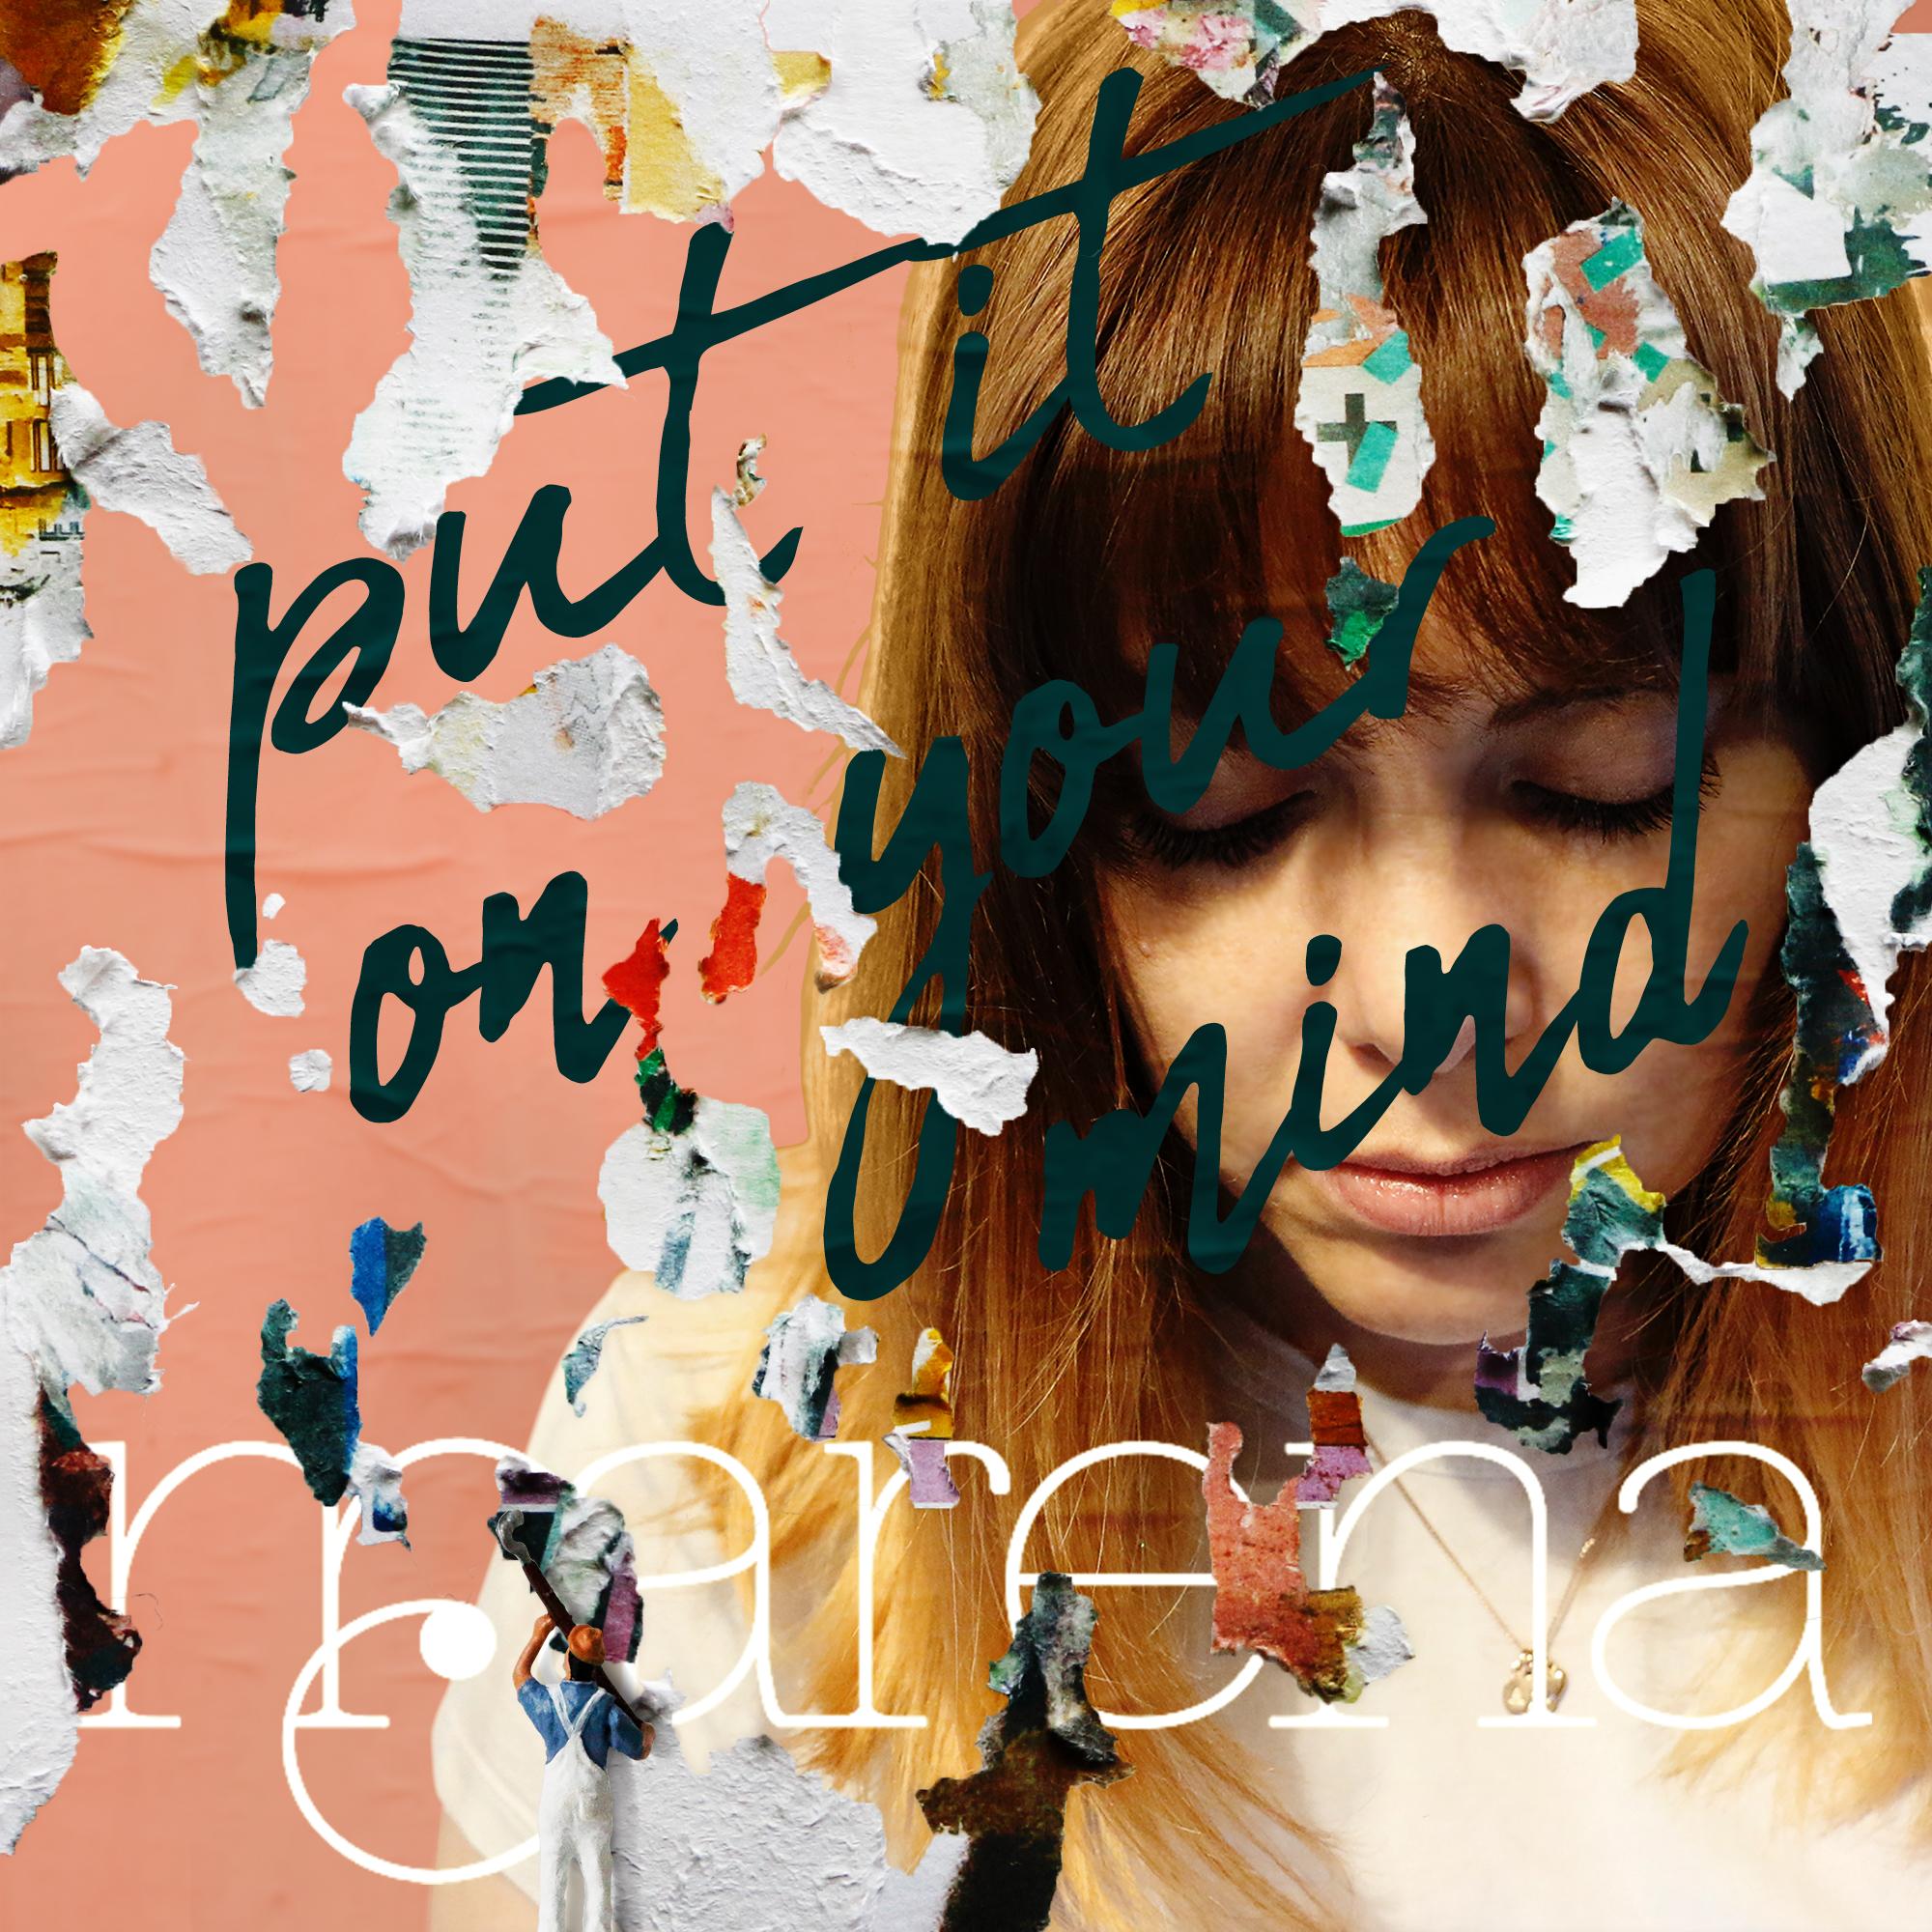 Marena - Put It On Your Mind